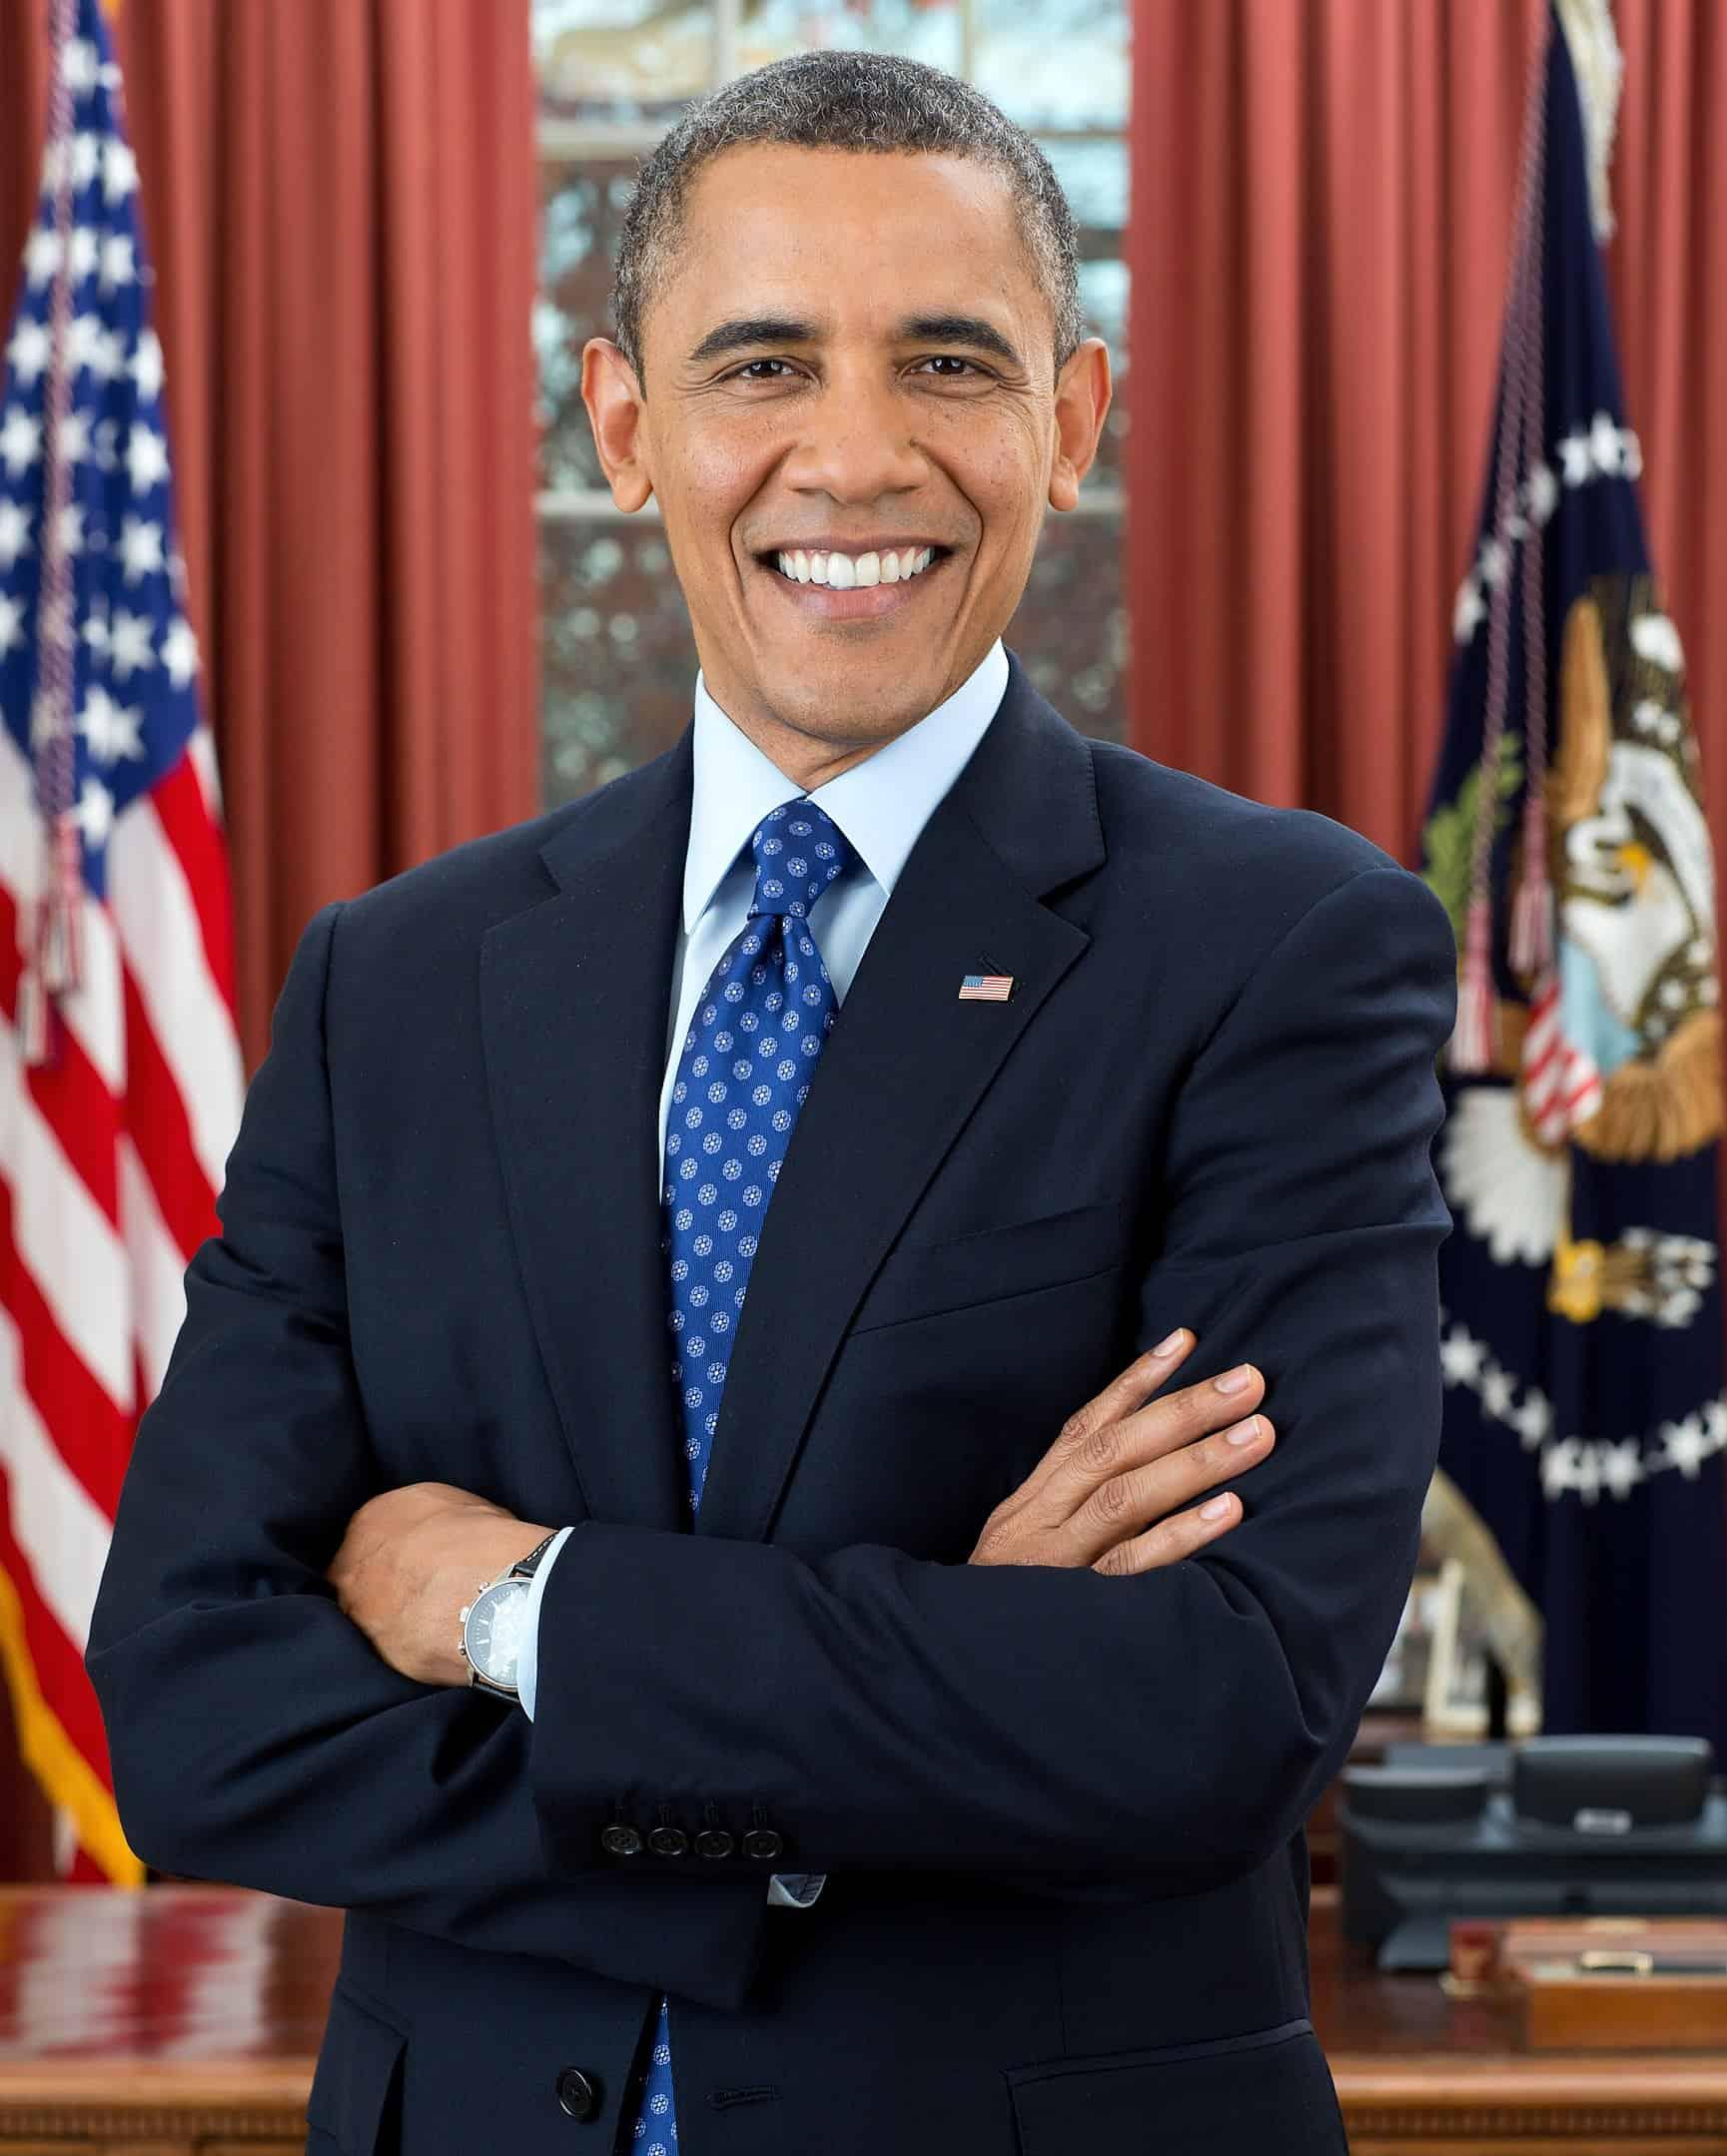 Barack Obama, Historical events facts